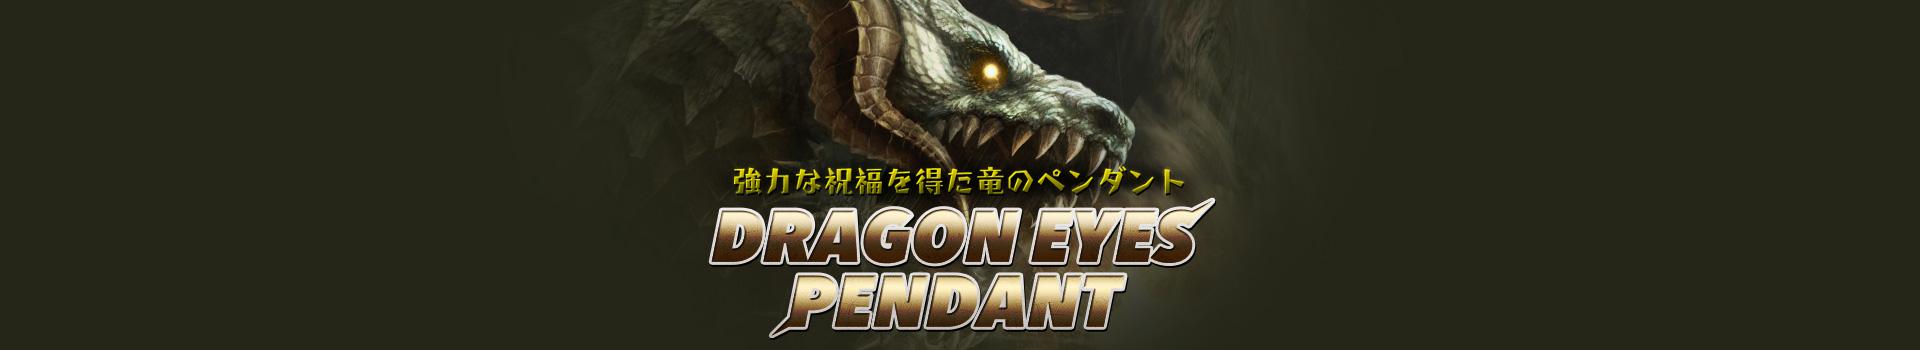 DRAGON EYES PENDANT